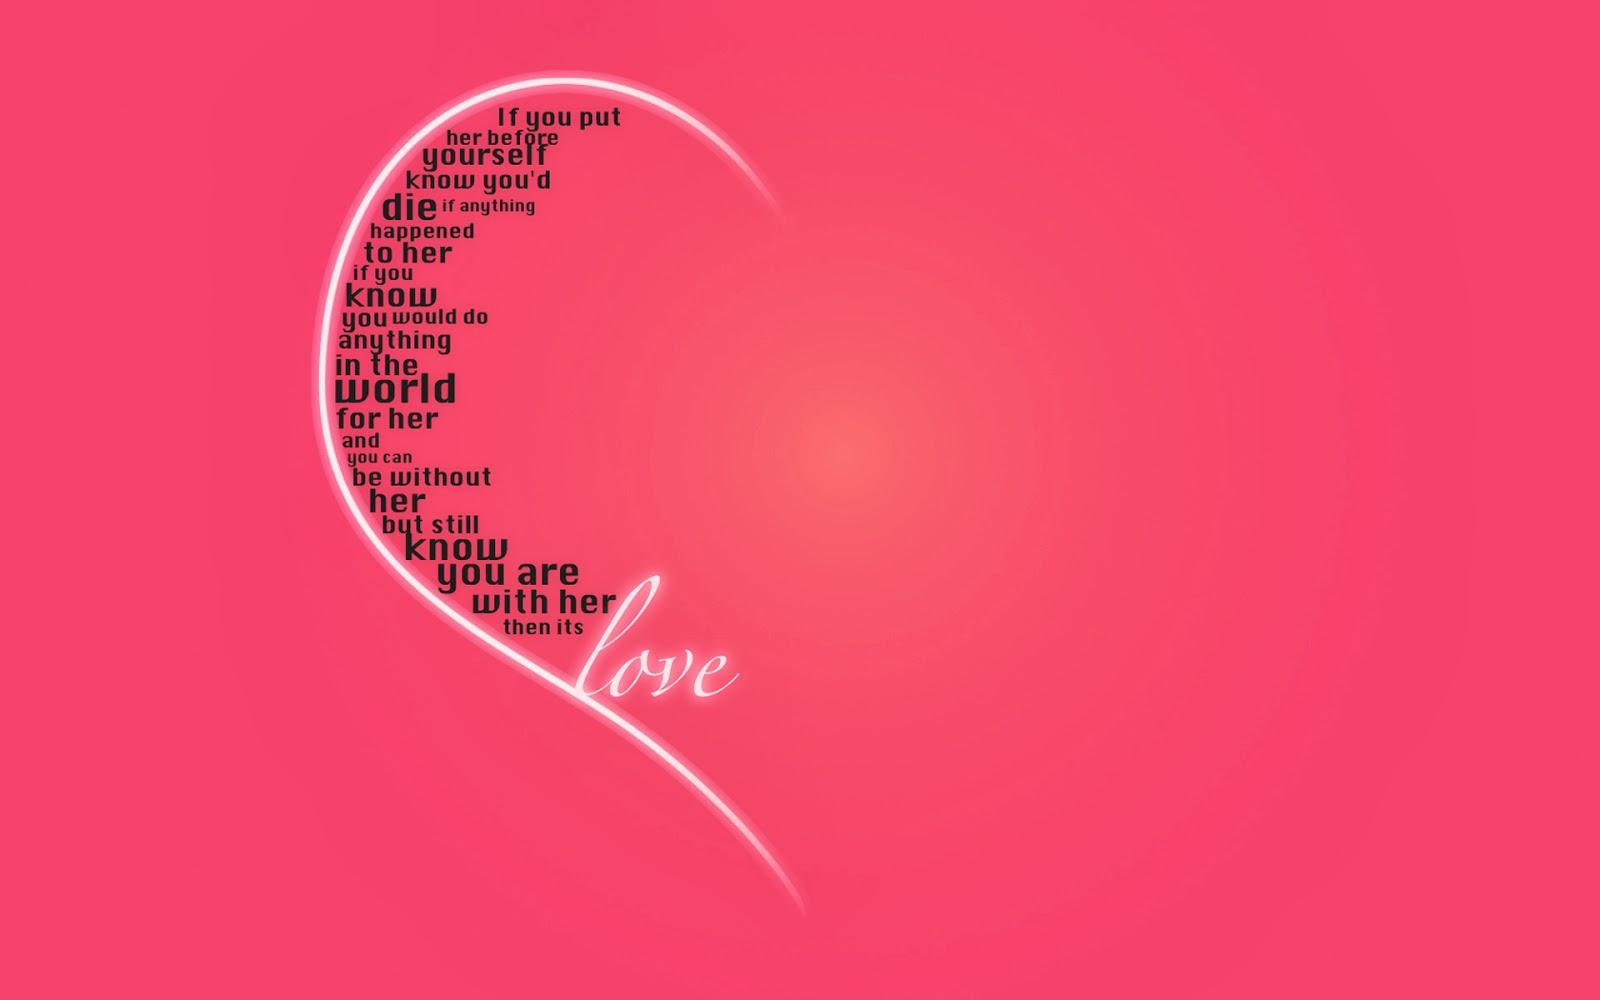 Fondo De Pantalla Dia De San Valentin Regalo Con Rosa: Imagenes Hilandy: Fondo De Pantalla Dia De San Valentin Love